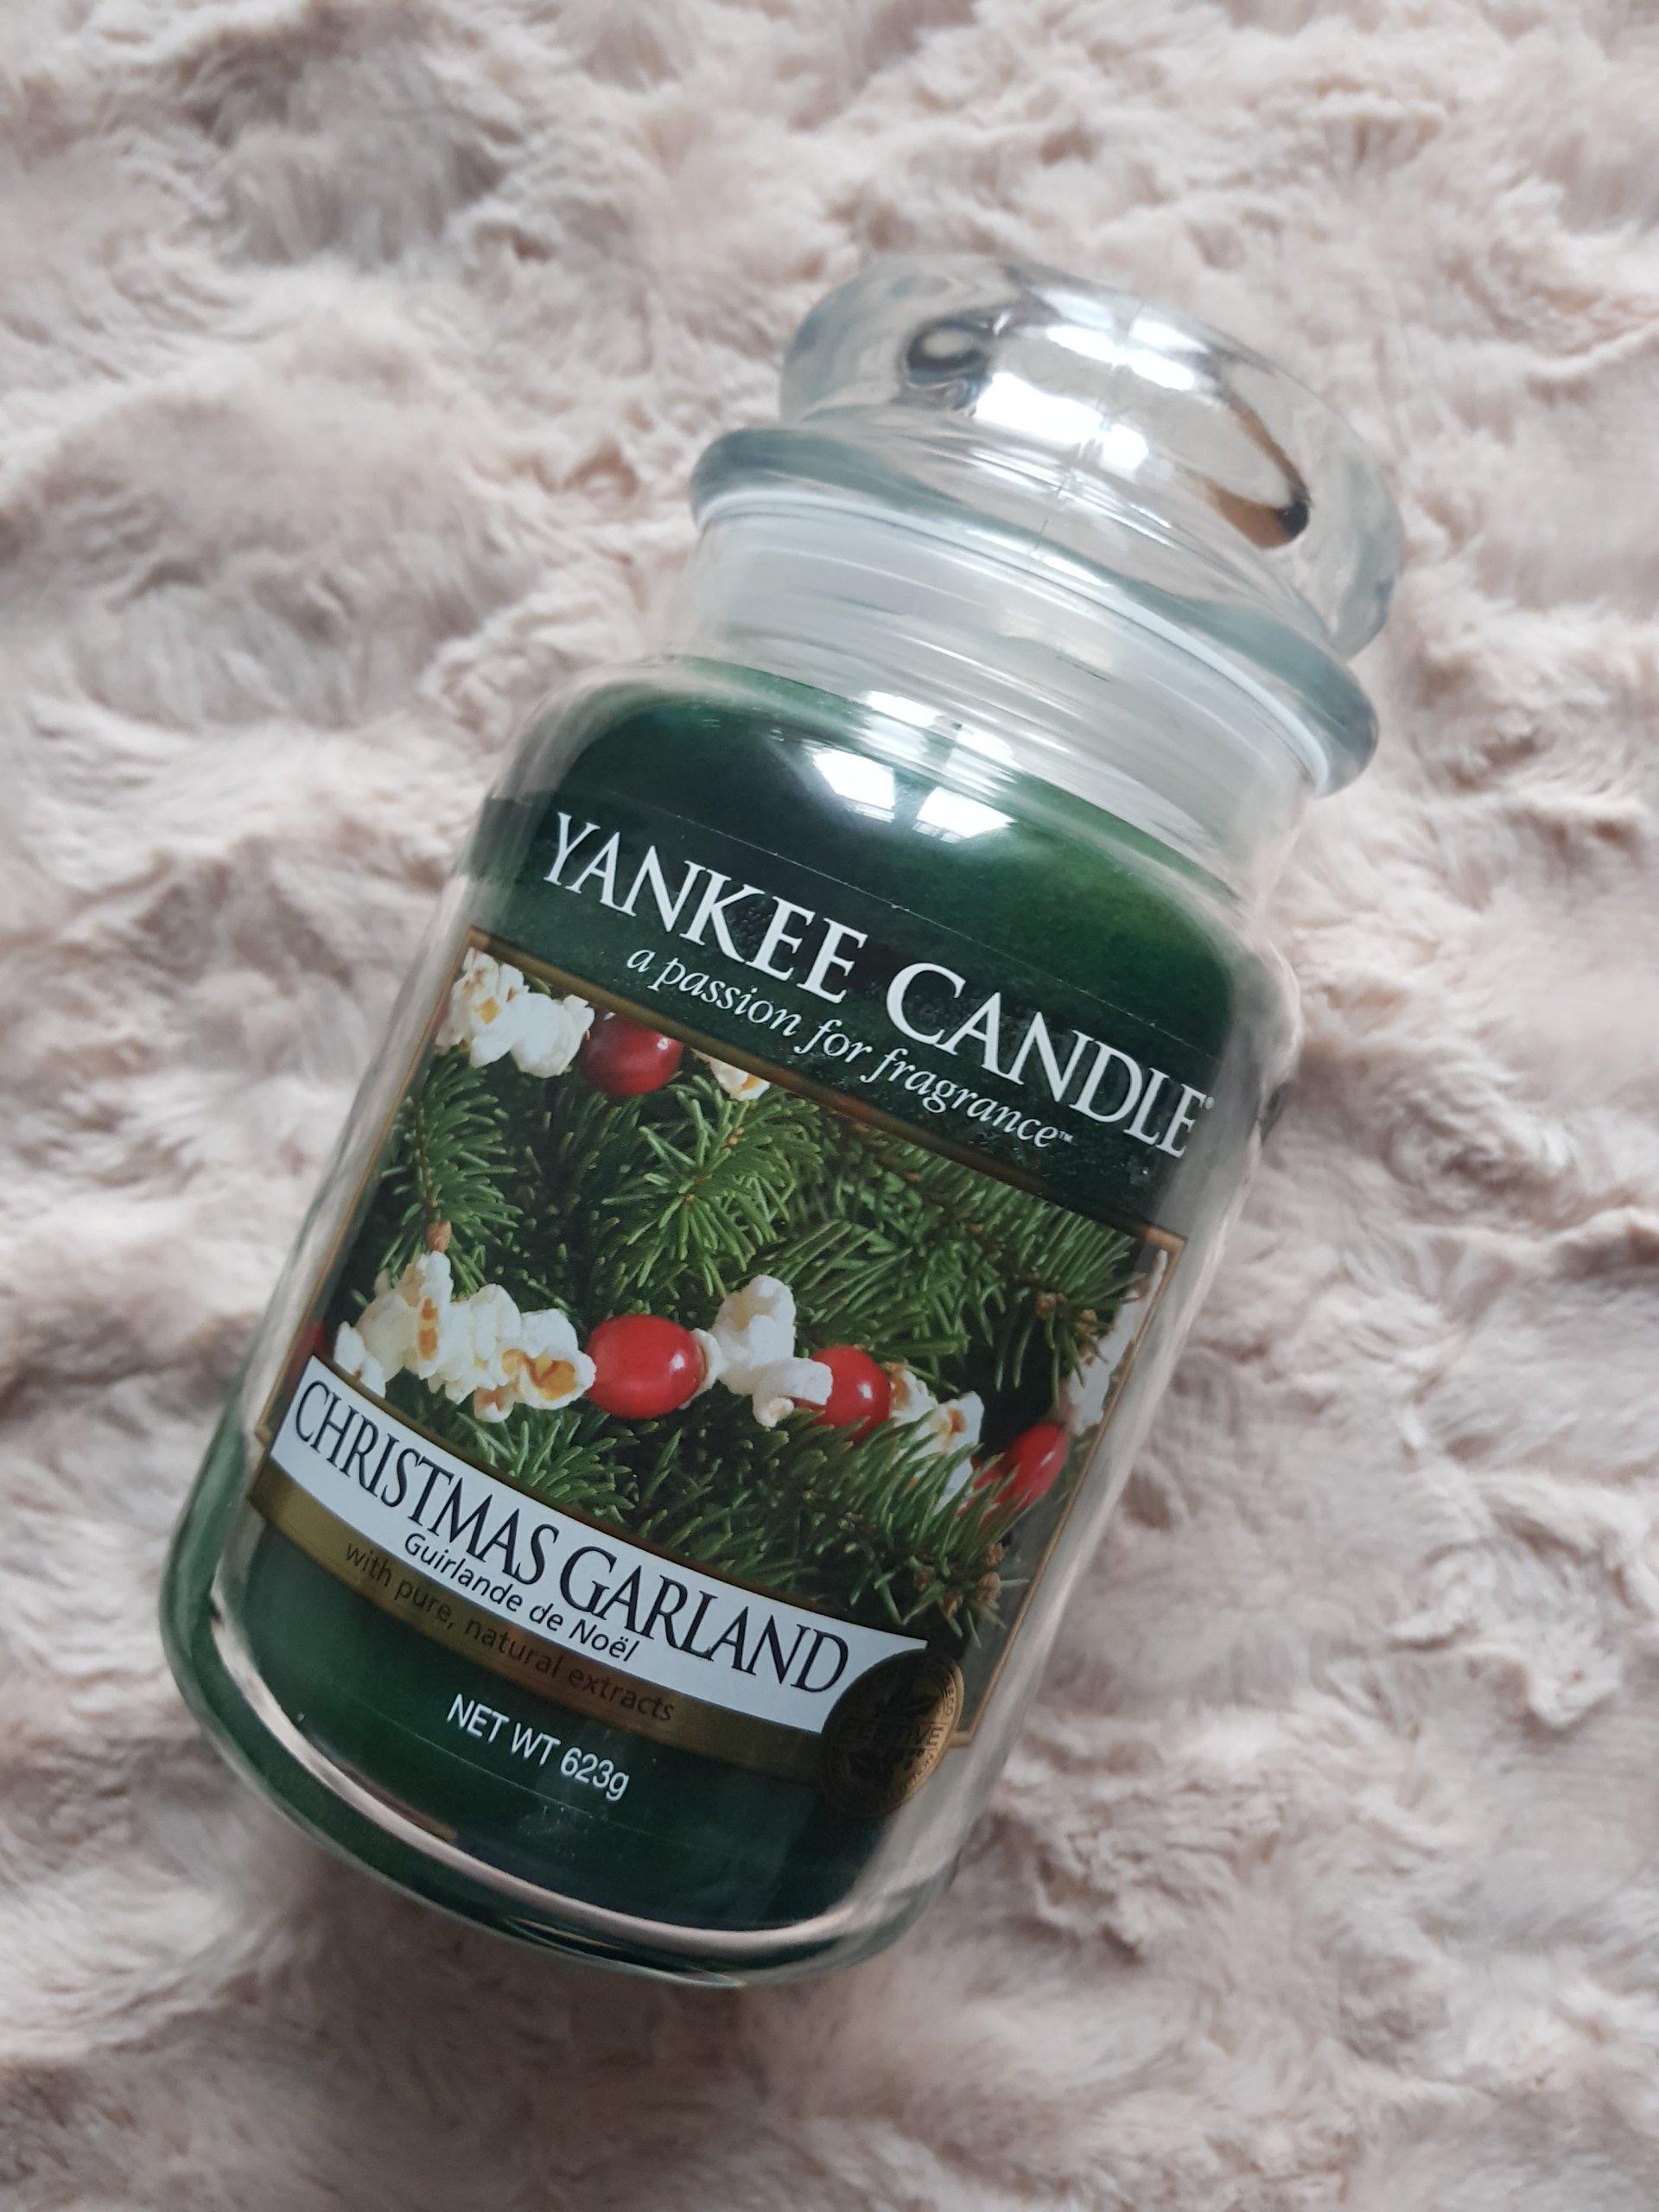 Christmas Garland Yankee Candle